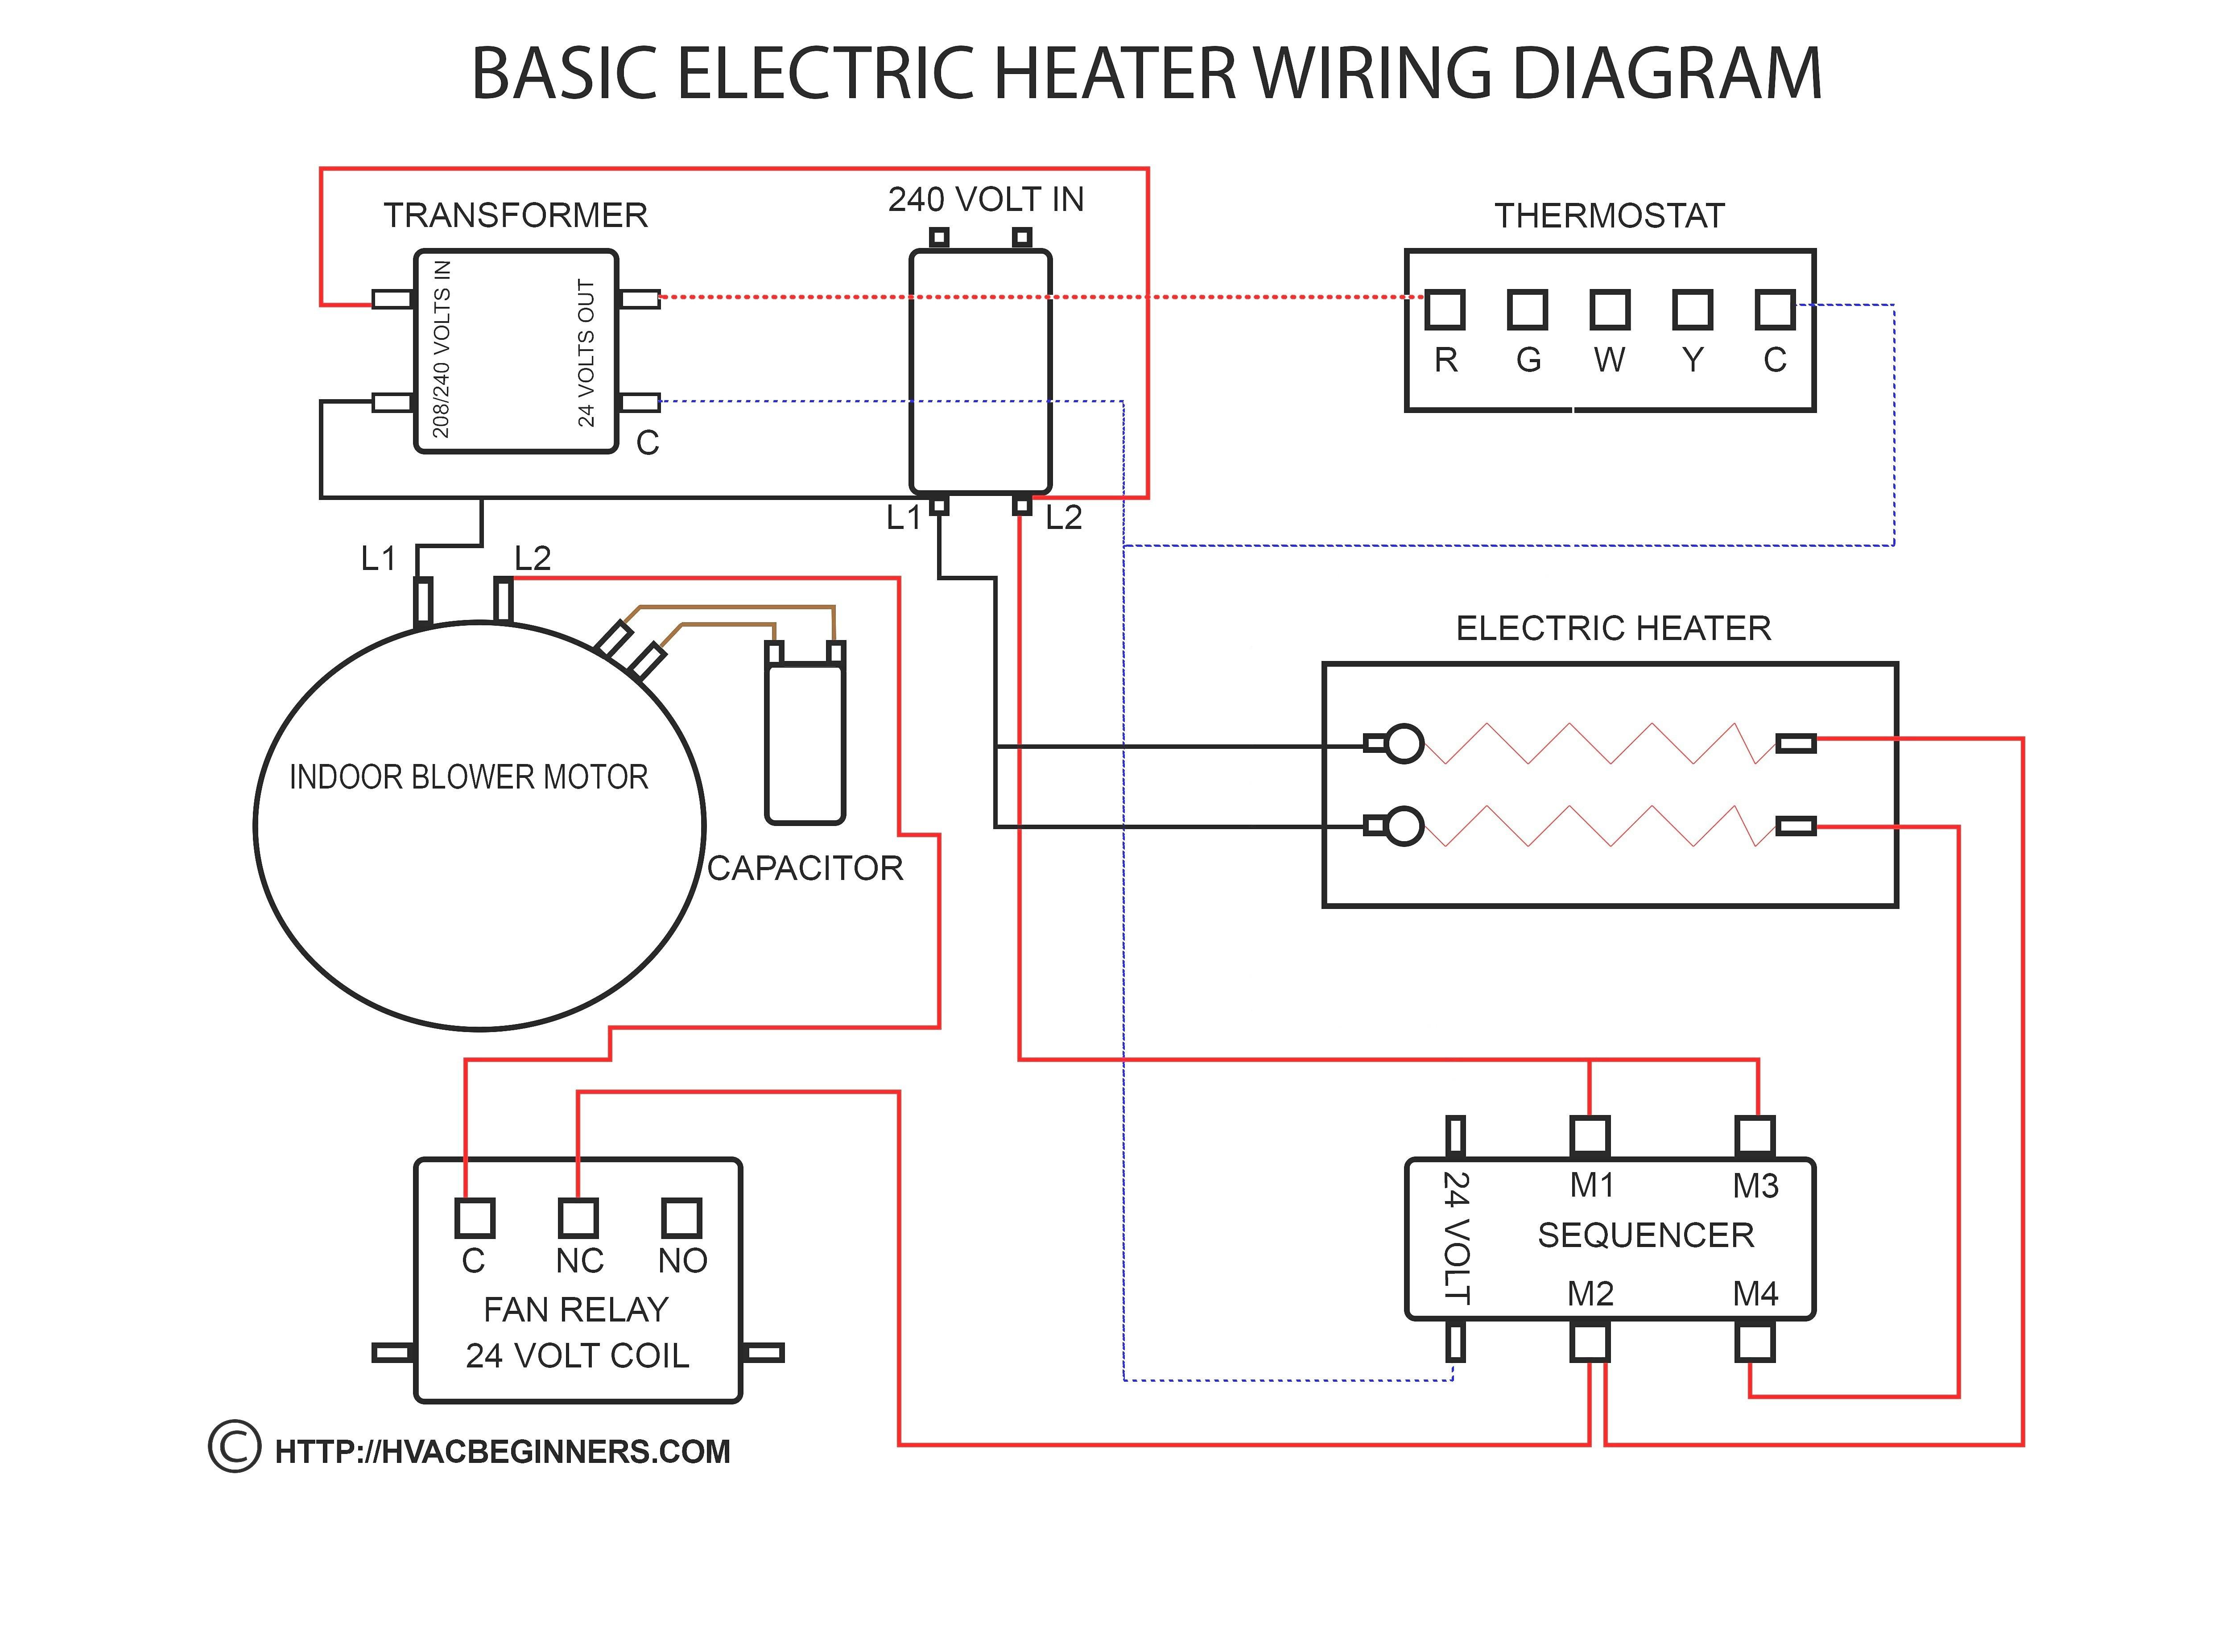 Bass Cat Wiring Diagram - 2006 Optima Audio Wiring Diagram for Wiring  Diagram Schematics | Bass Cat Wiring Diagram |  | Wiring Diagram Schematics